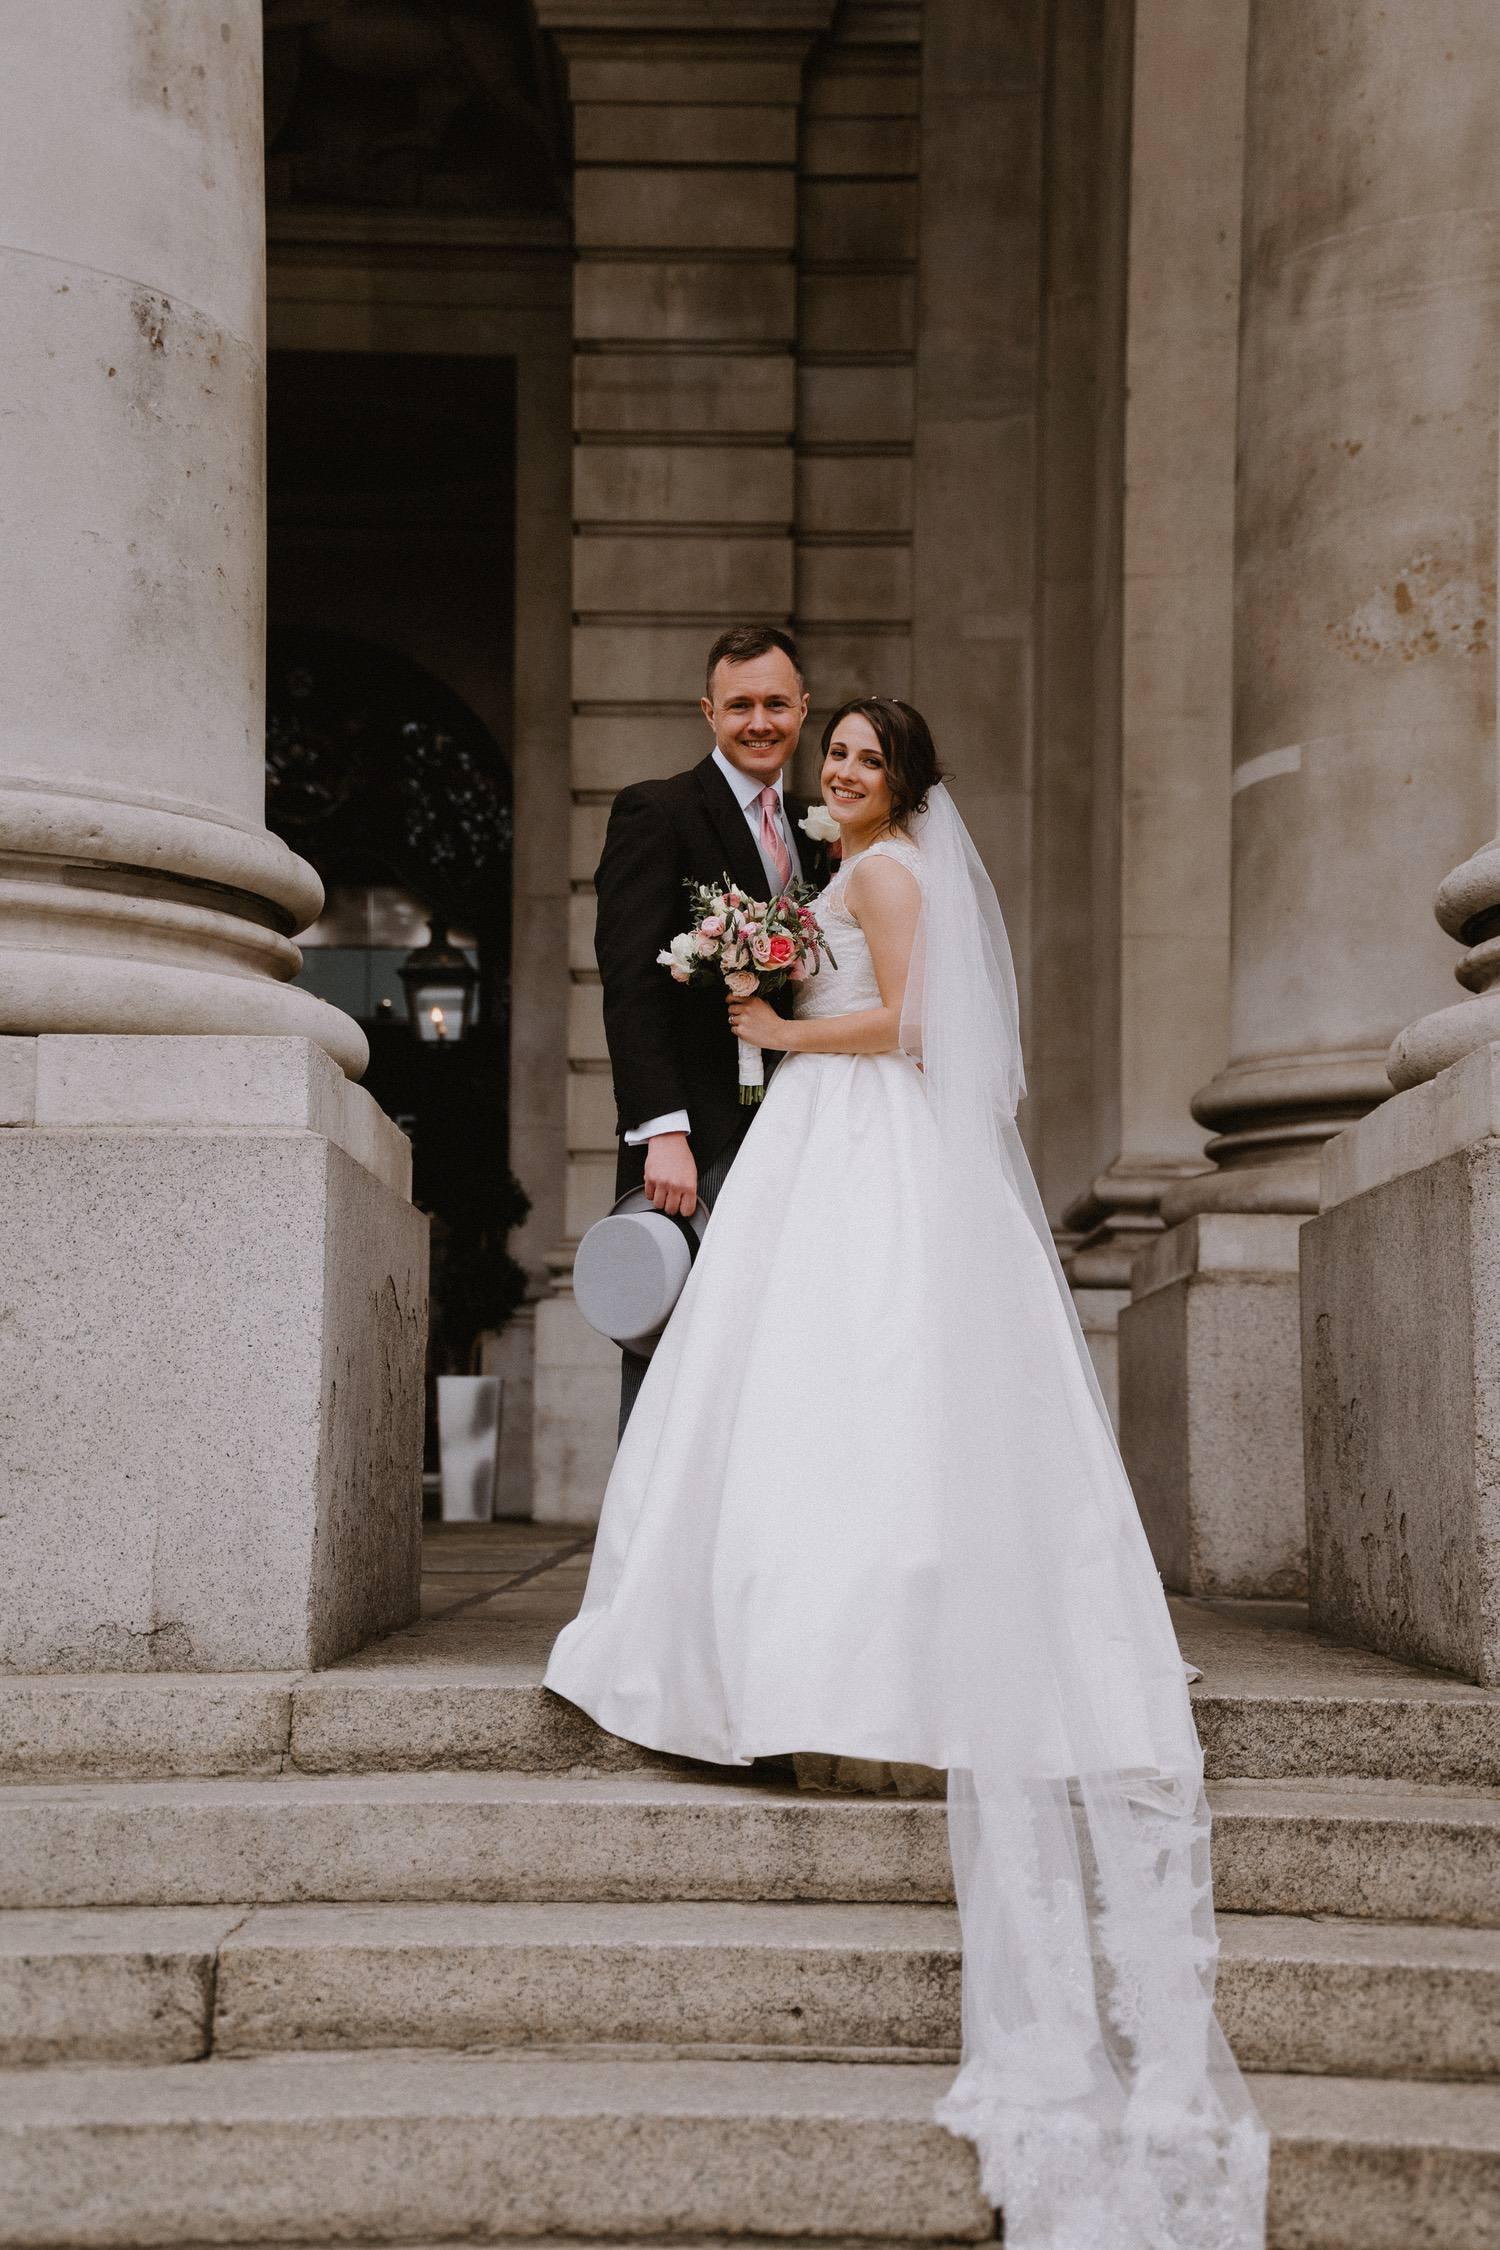 Mansion-House-London-Wedding-Photos-71.jpg